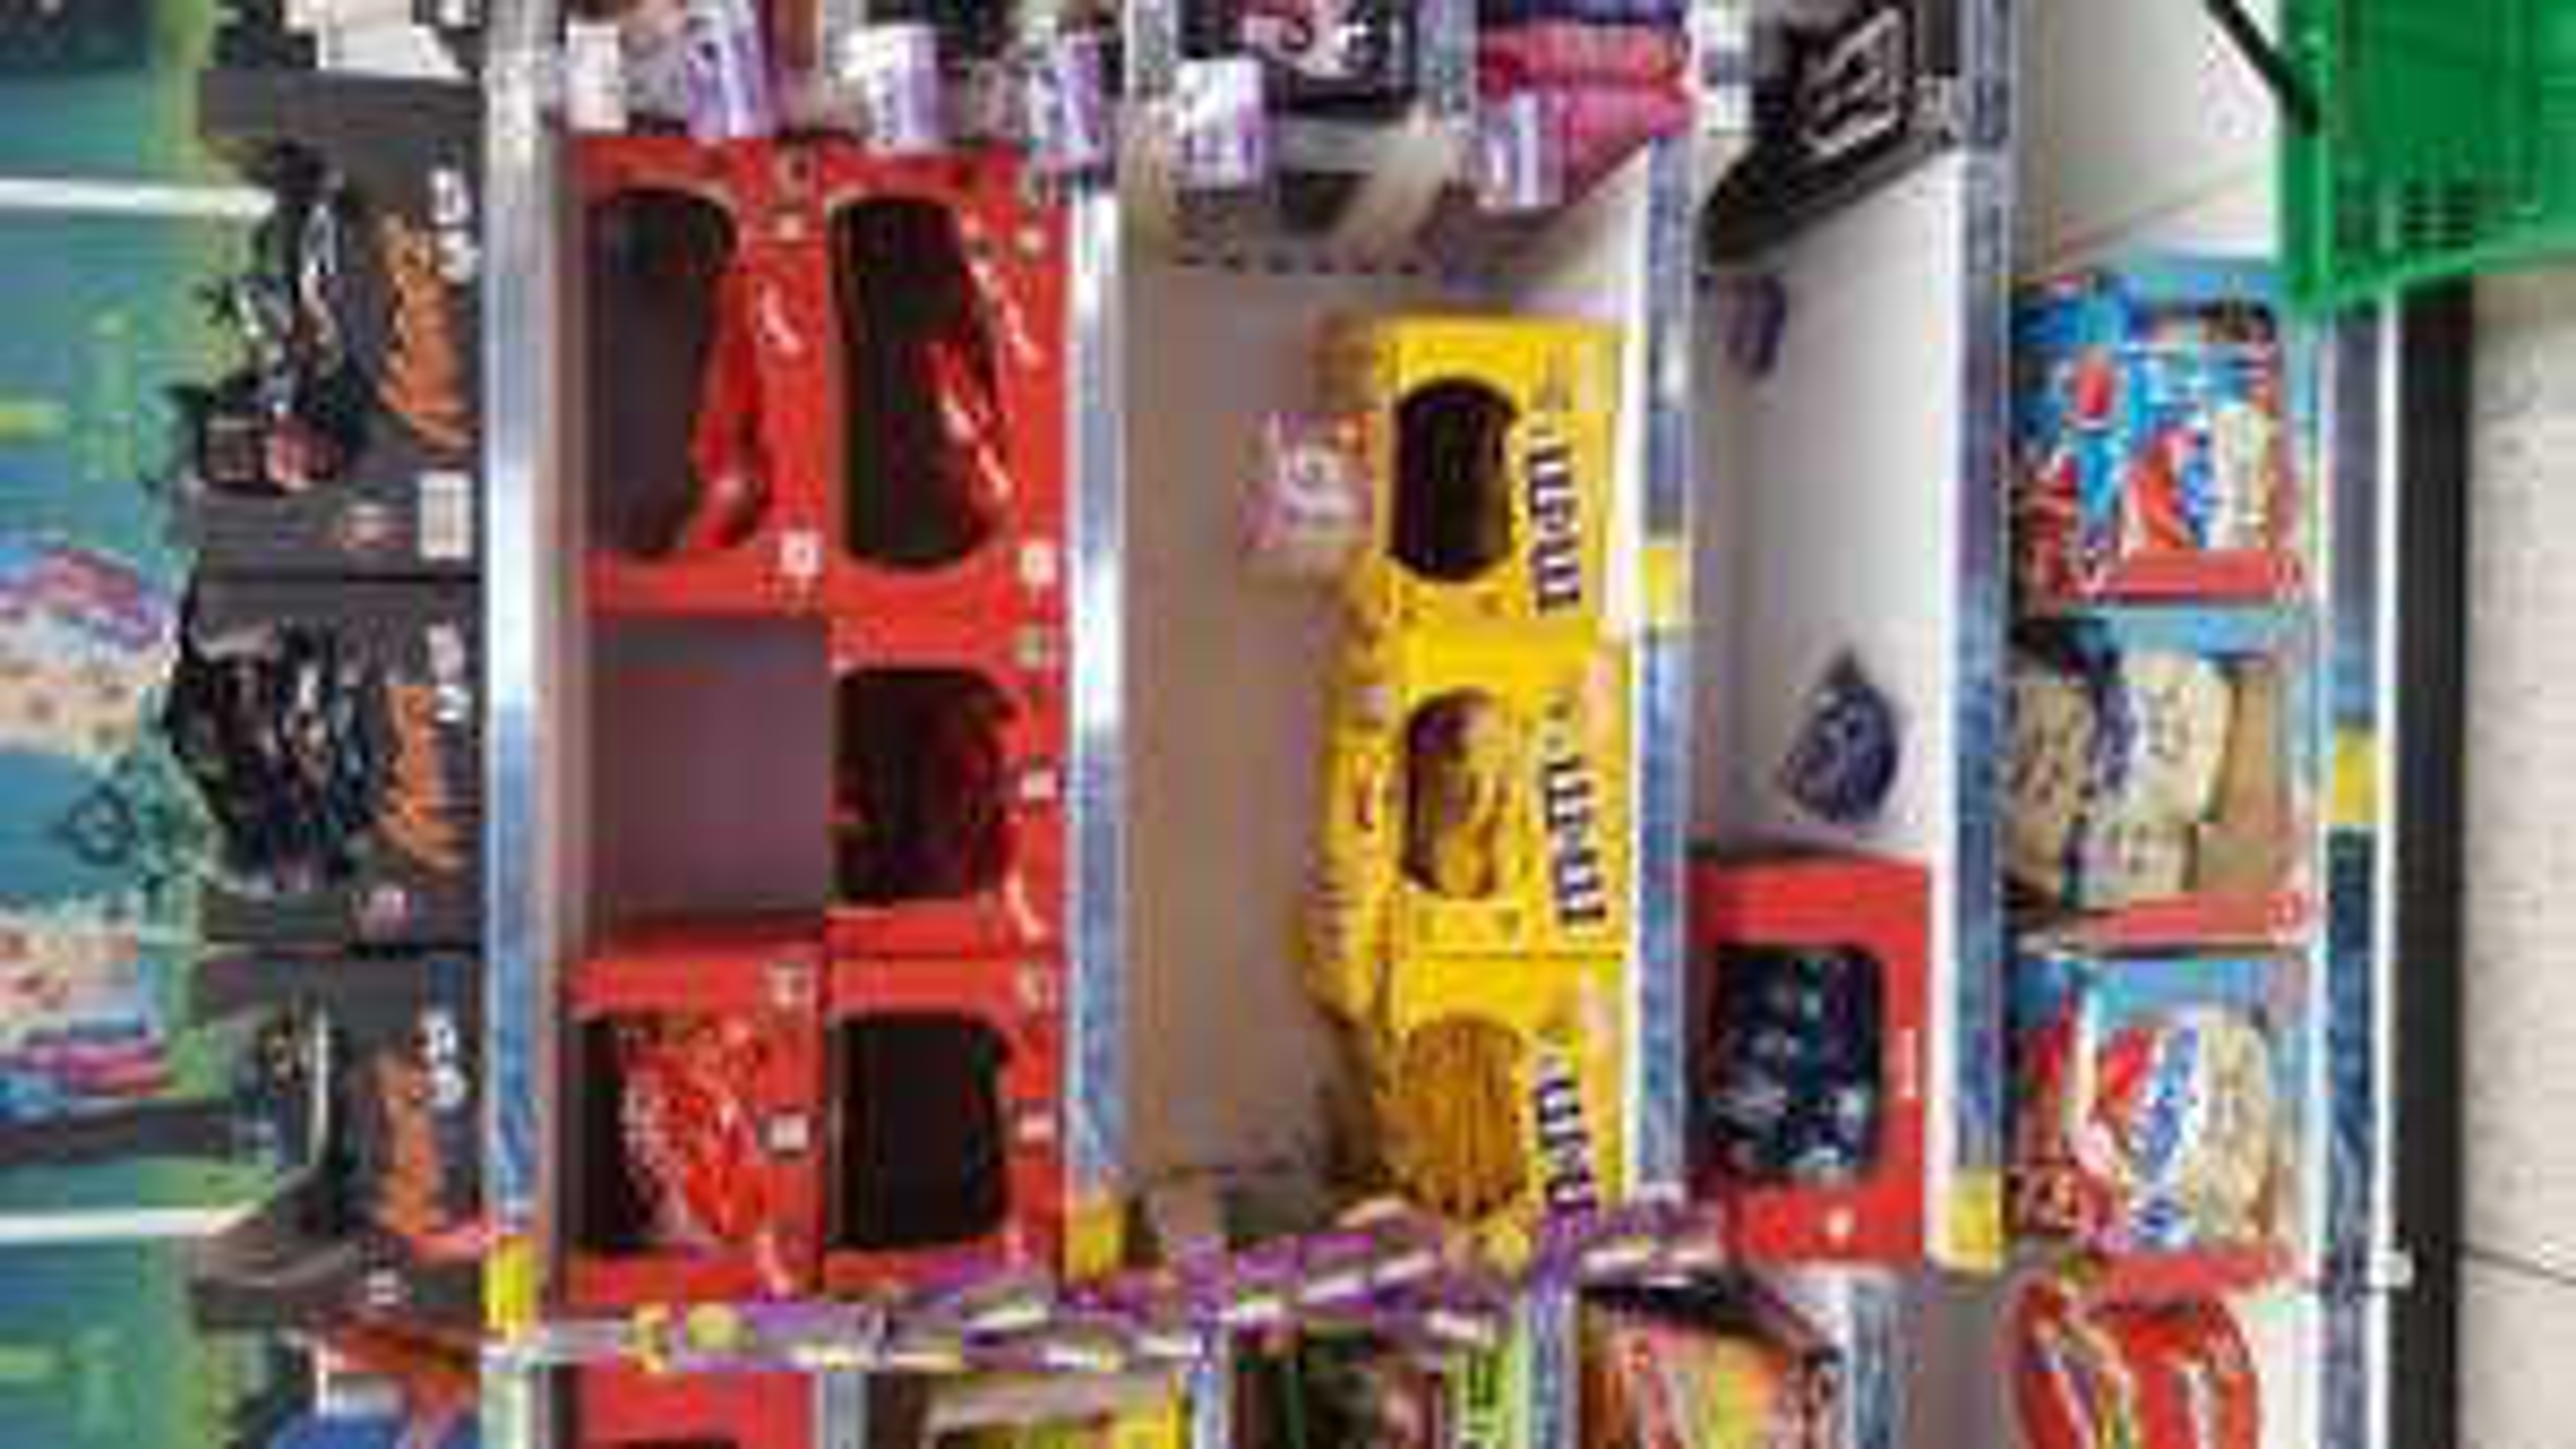 M&Ms, Mars, Milkybar, Maltesers funsize 11 bags £1.40 in asda